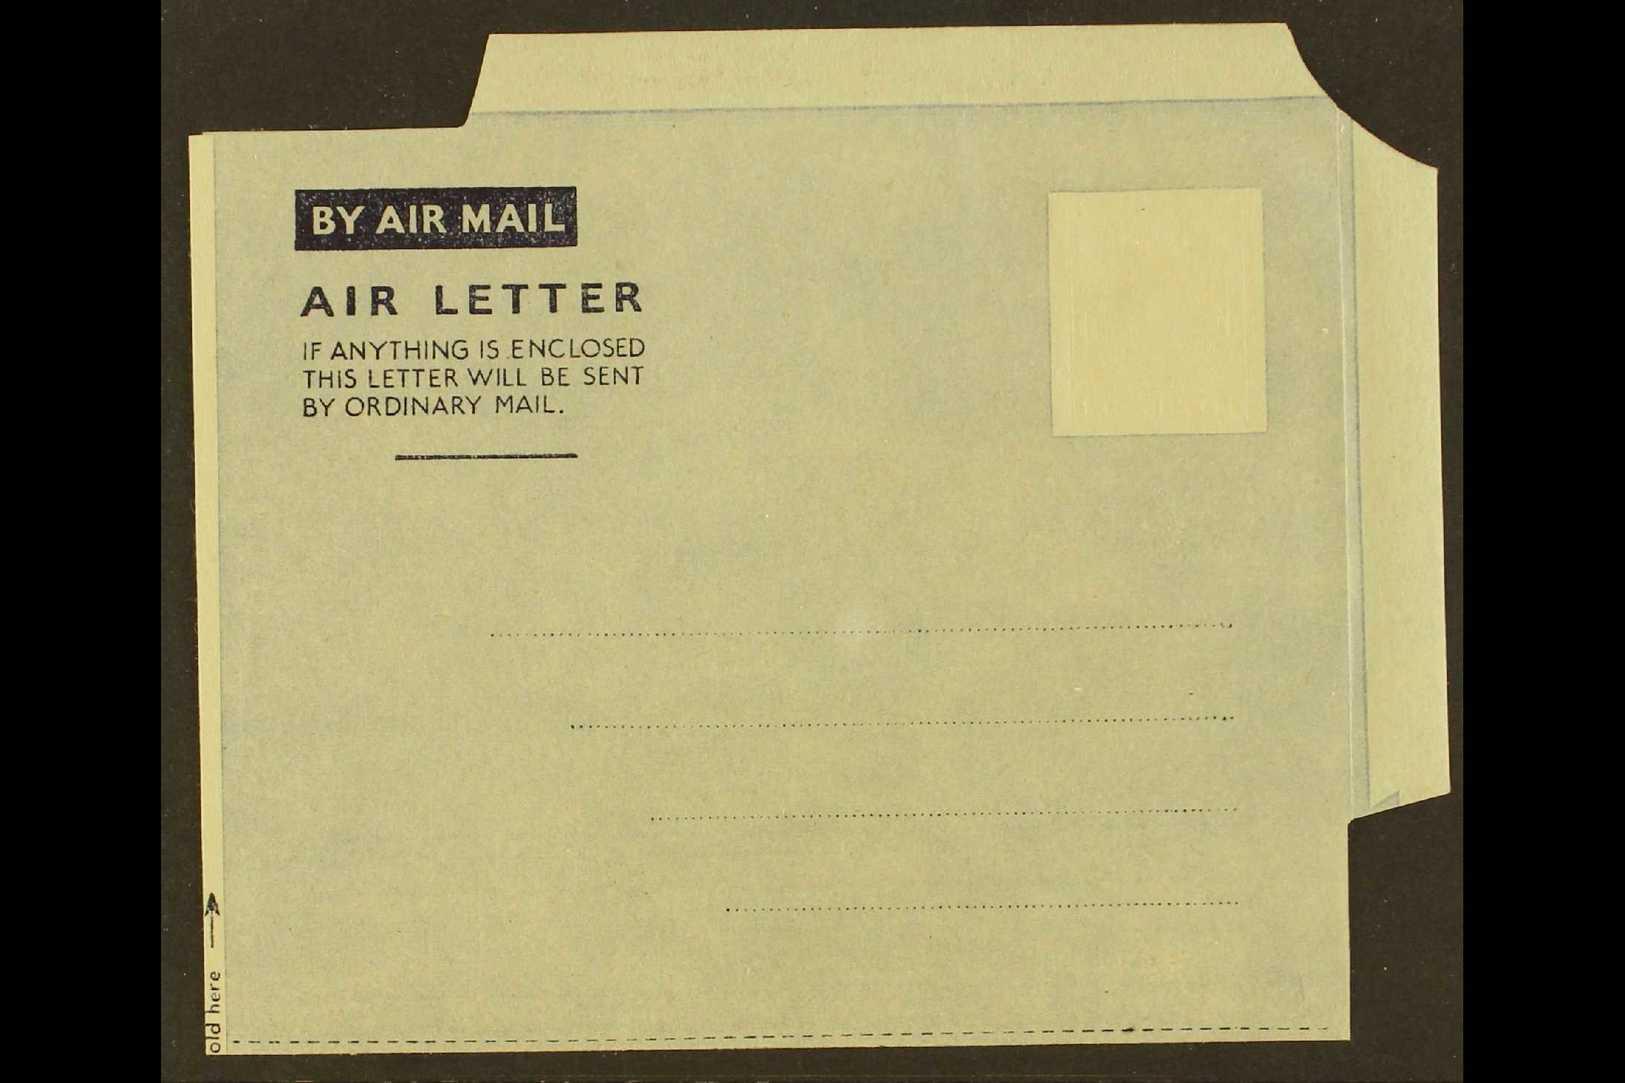 AIR LETTER SHEET ERROR 1943 6d Aerogramme (Tablet Type A-1) With ALBINO IMPRESSION OF STAMP DESIGN (Kessler 1d, Higgins  - Unclassified